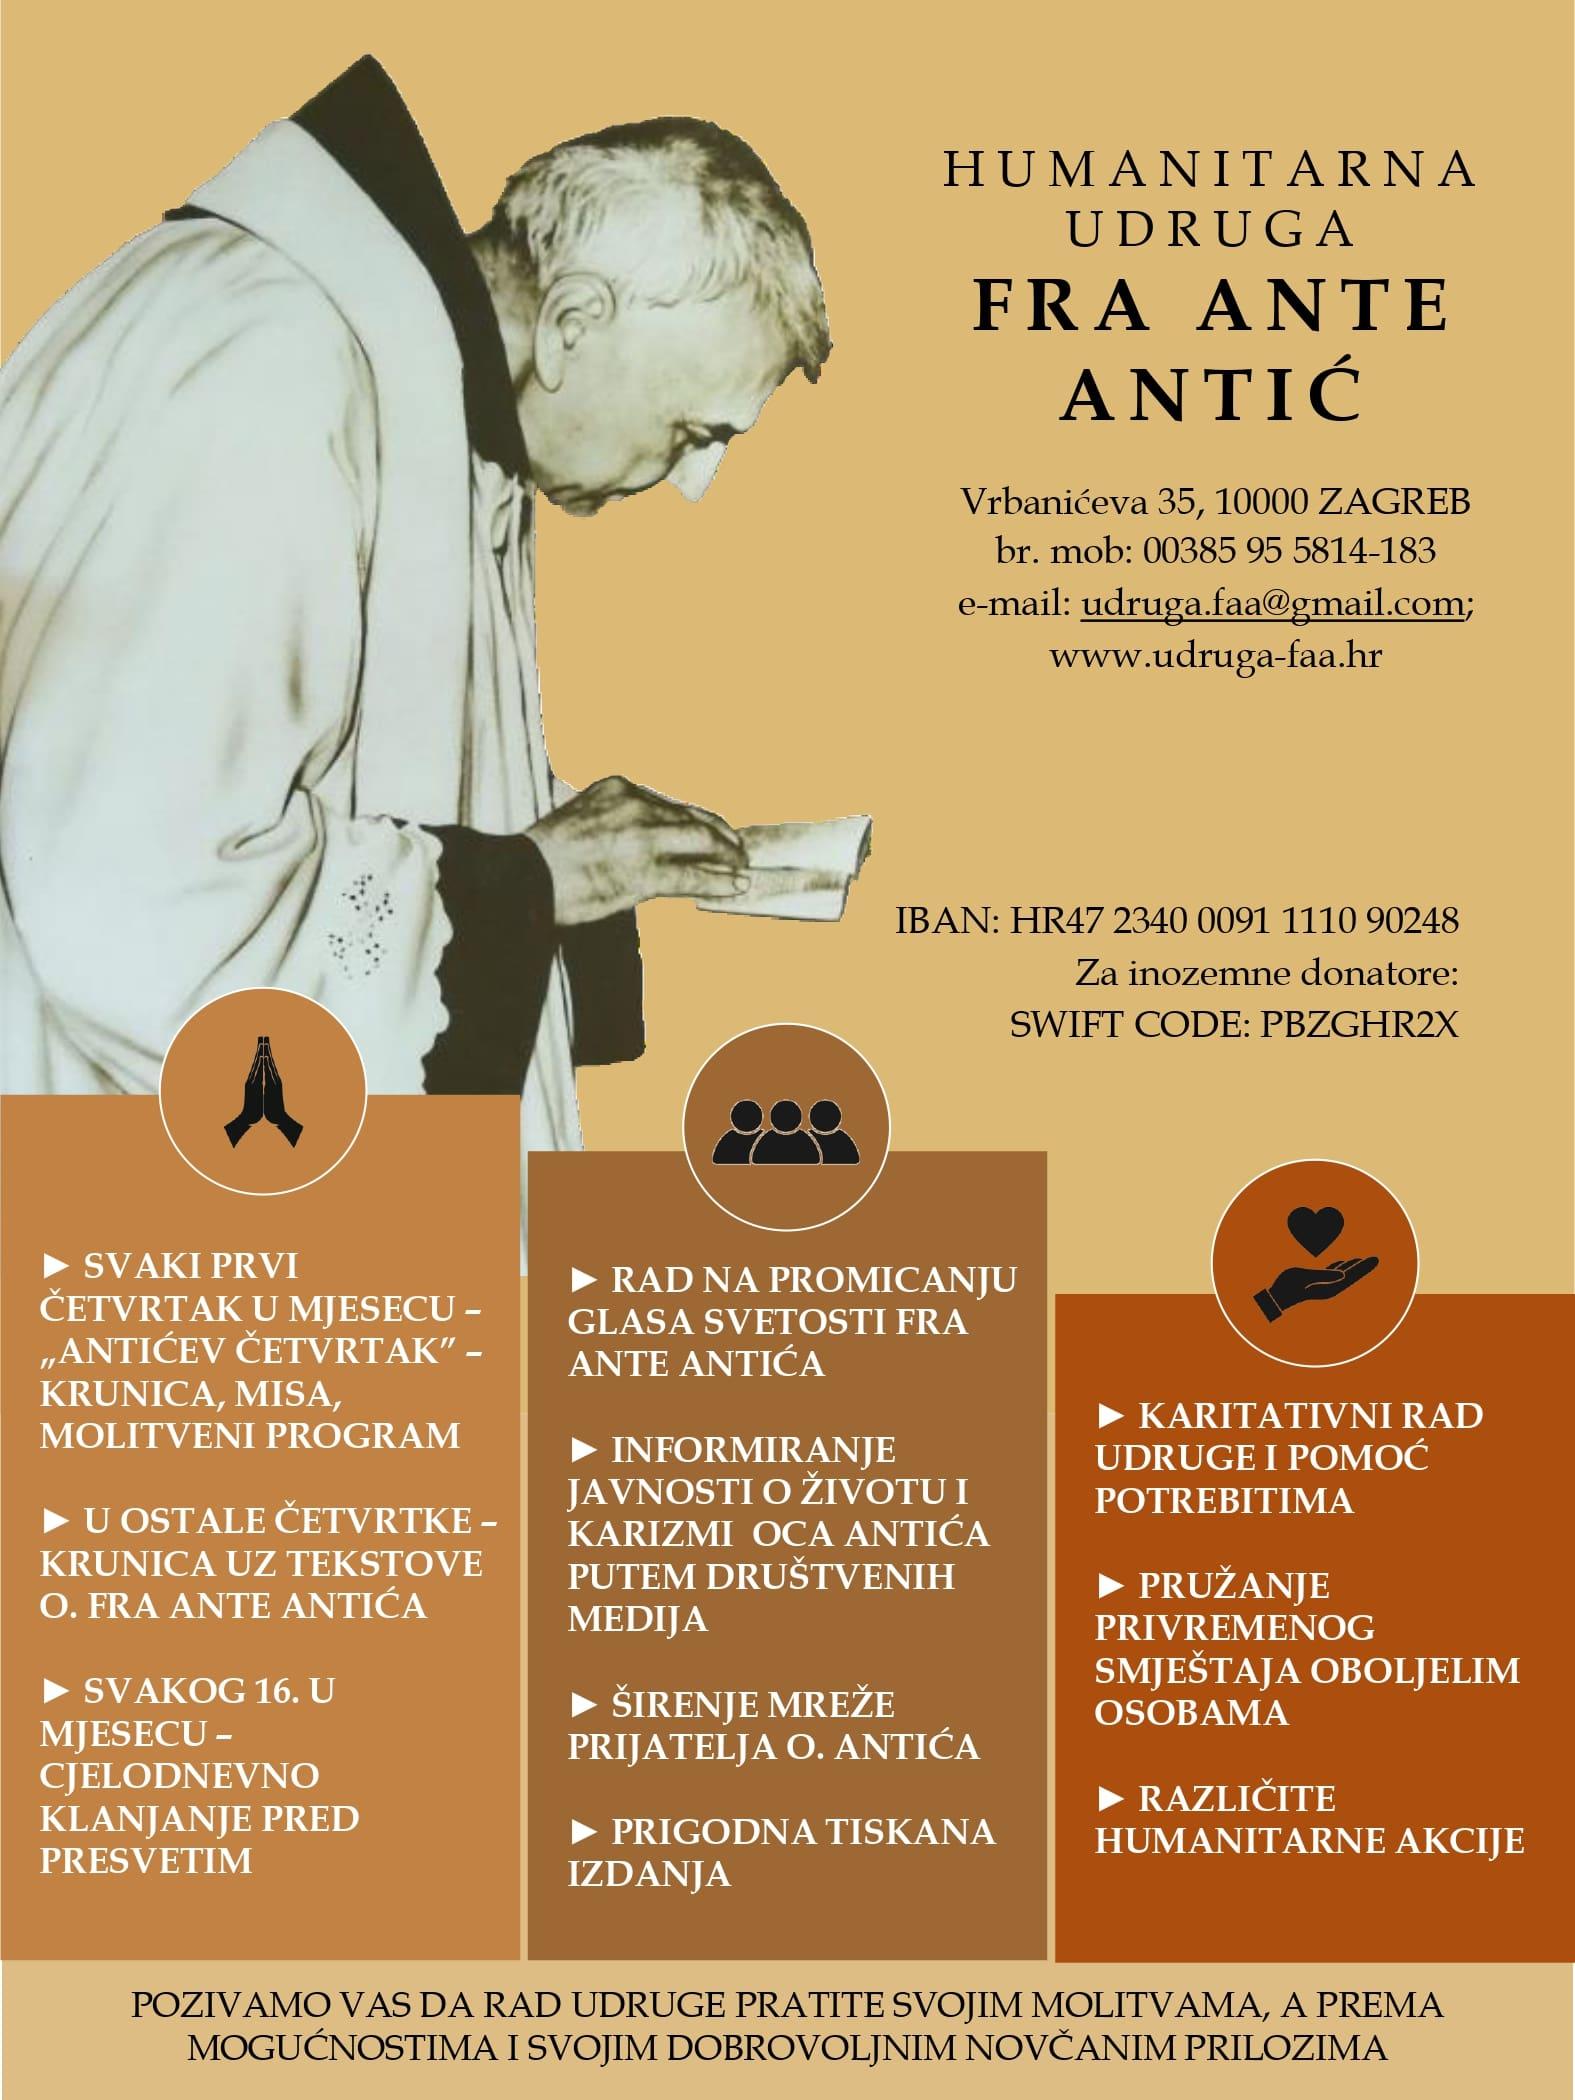 Plakat Udruga fra Ante Antić_page-0001-min